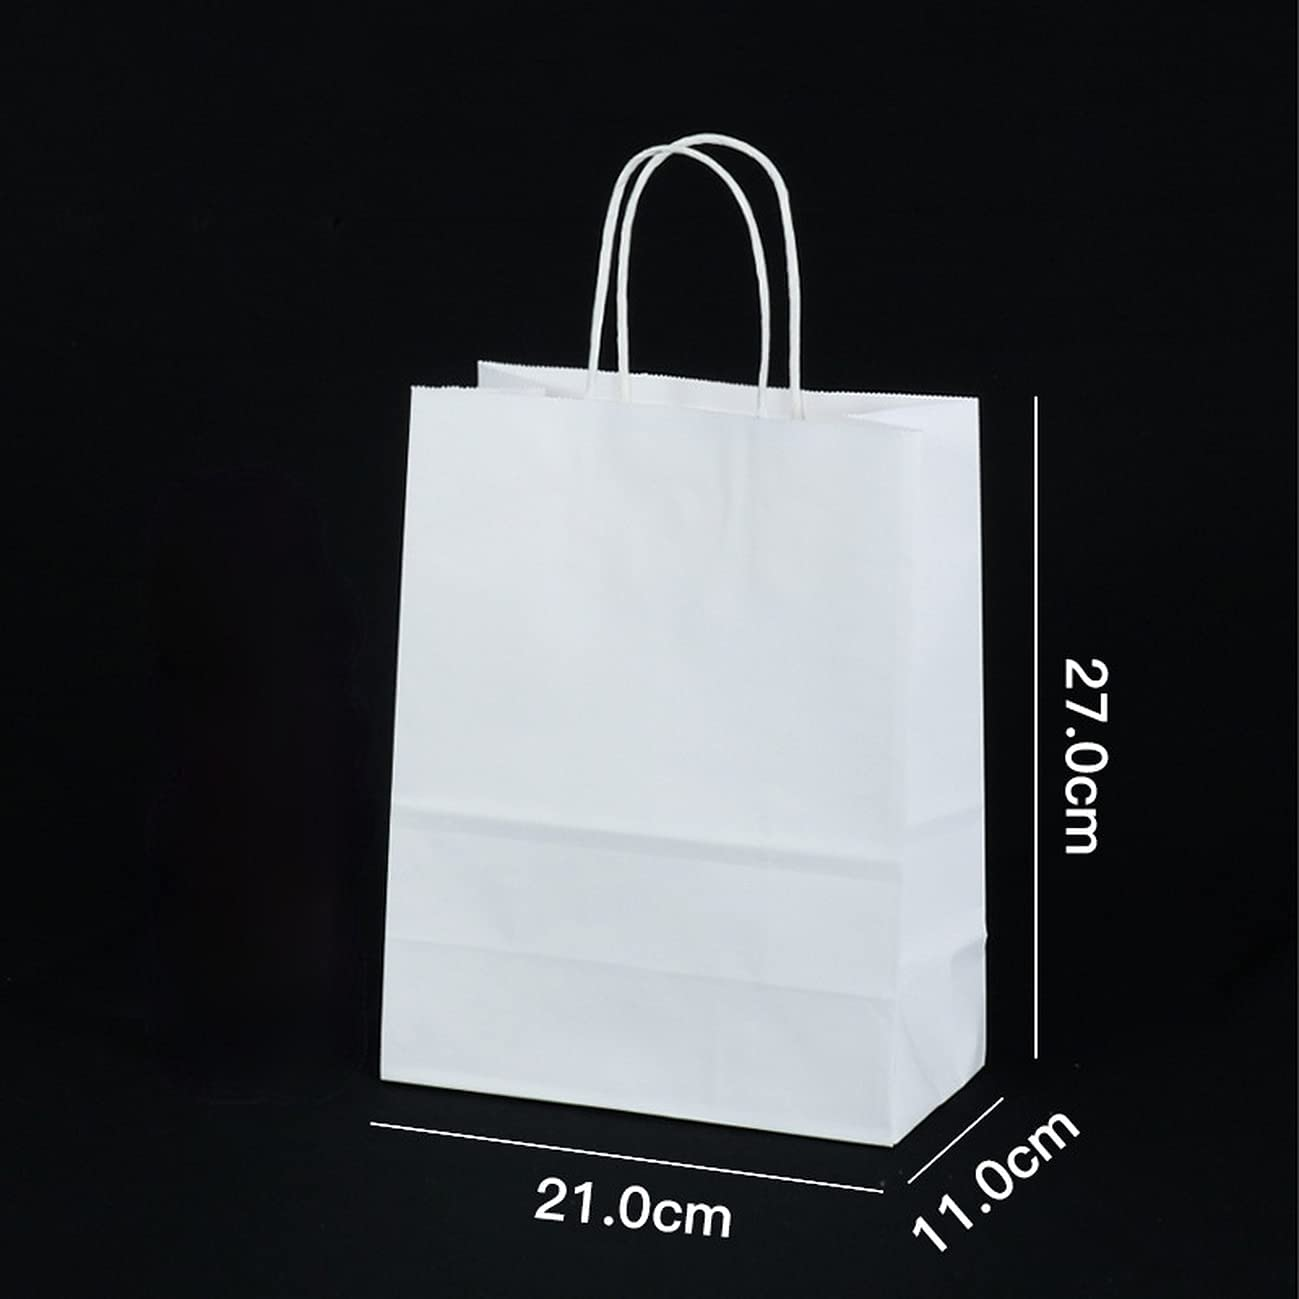 AHTOSKA 50PC Recycled Biodegradable Kraft Paper Tote Bag Food De